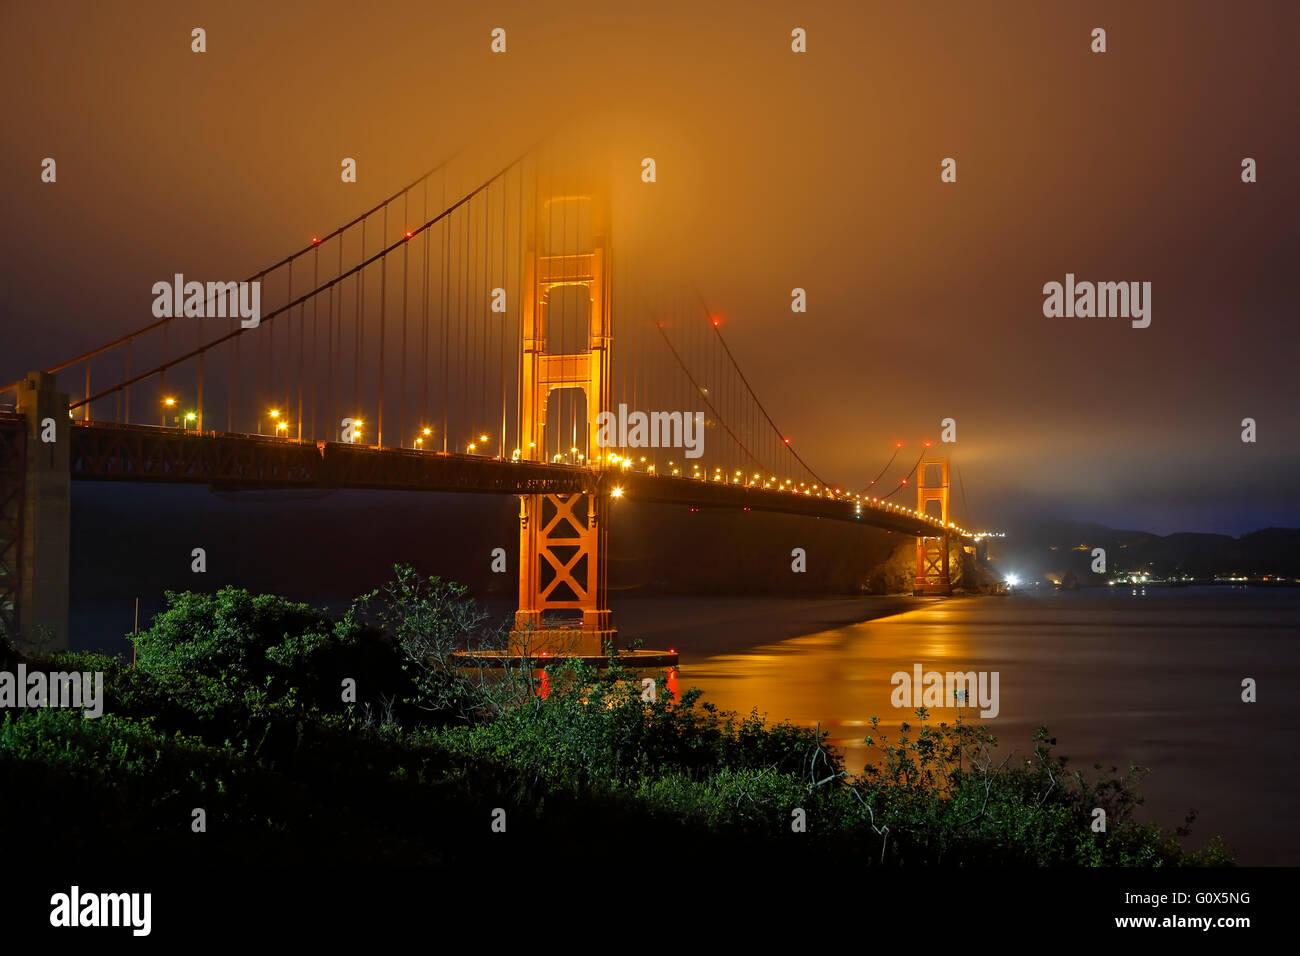 Golden Gate Brücke im Nebel, San Francisco, Kalifornien, USA Stockbild